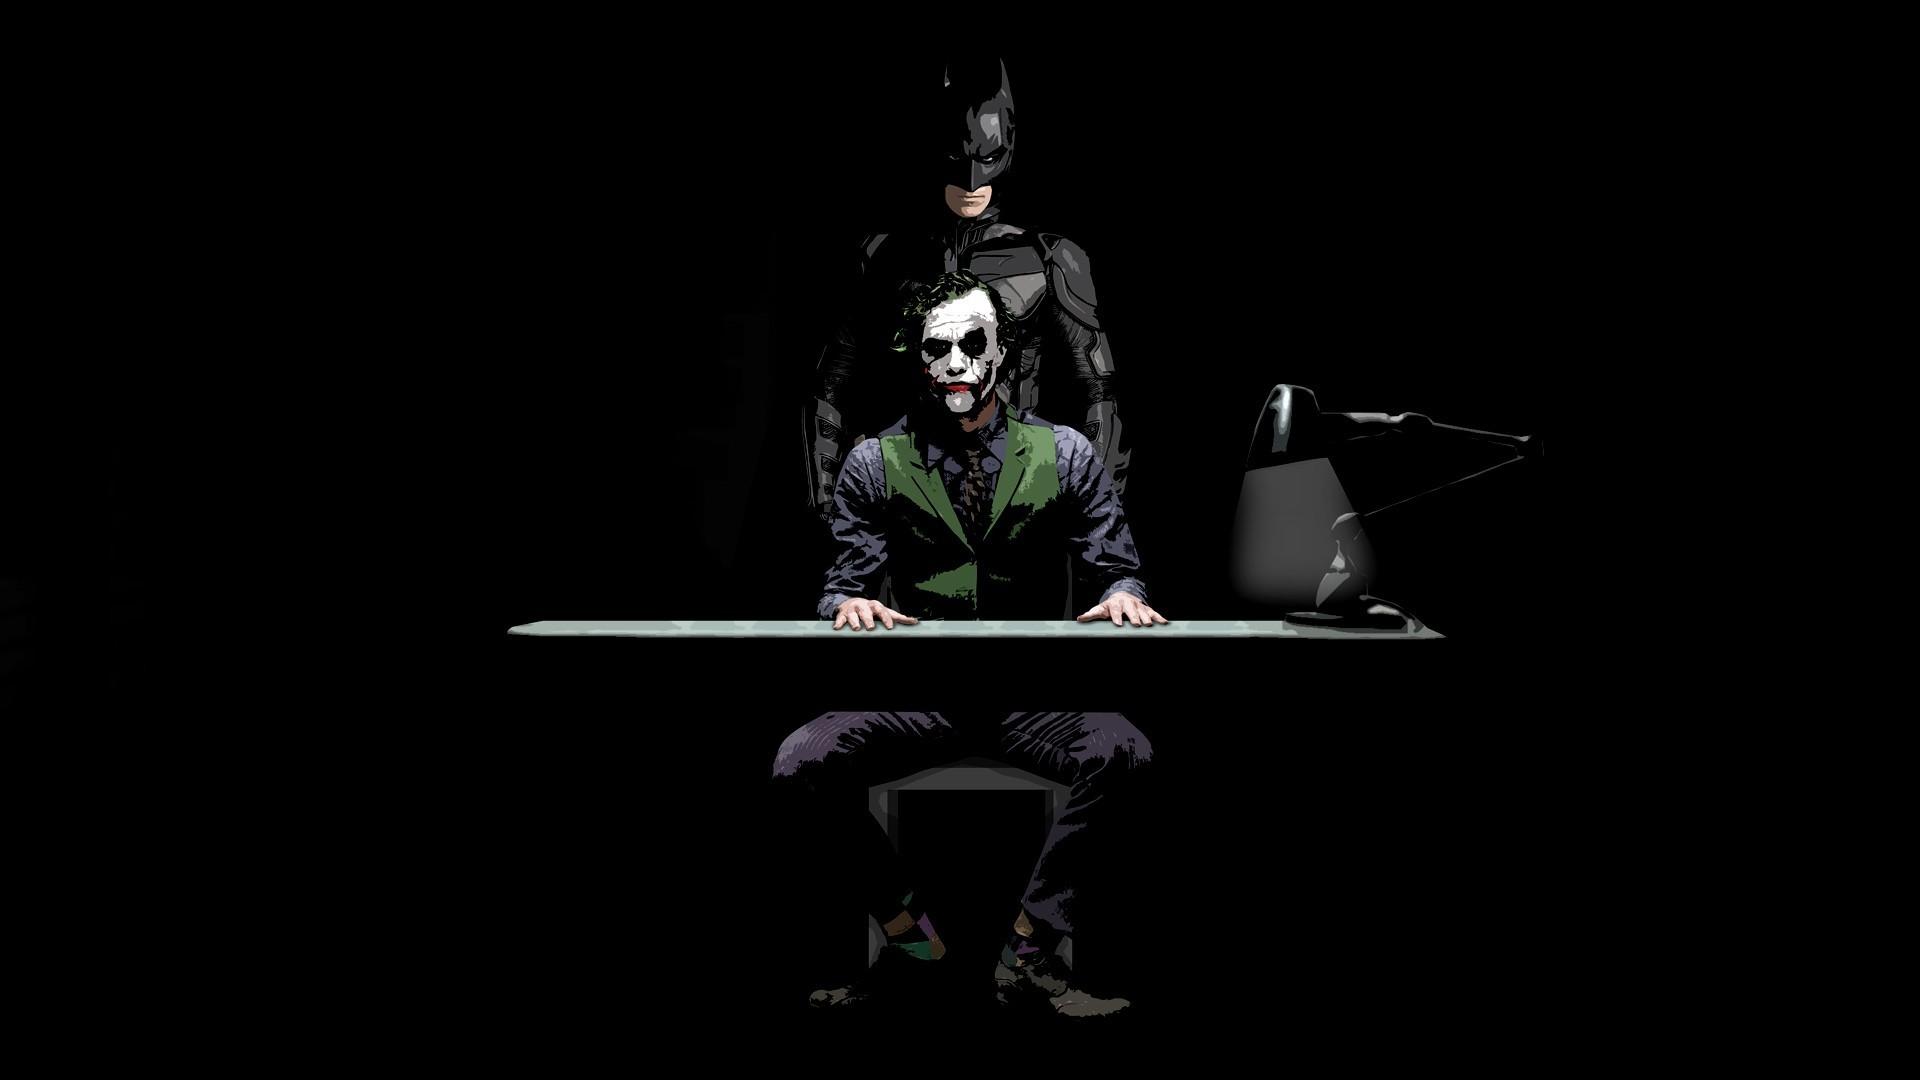 Collection of Batman Joker Wallpaper Dark Knight on HDWallpapers